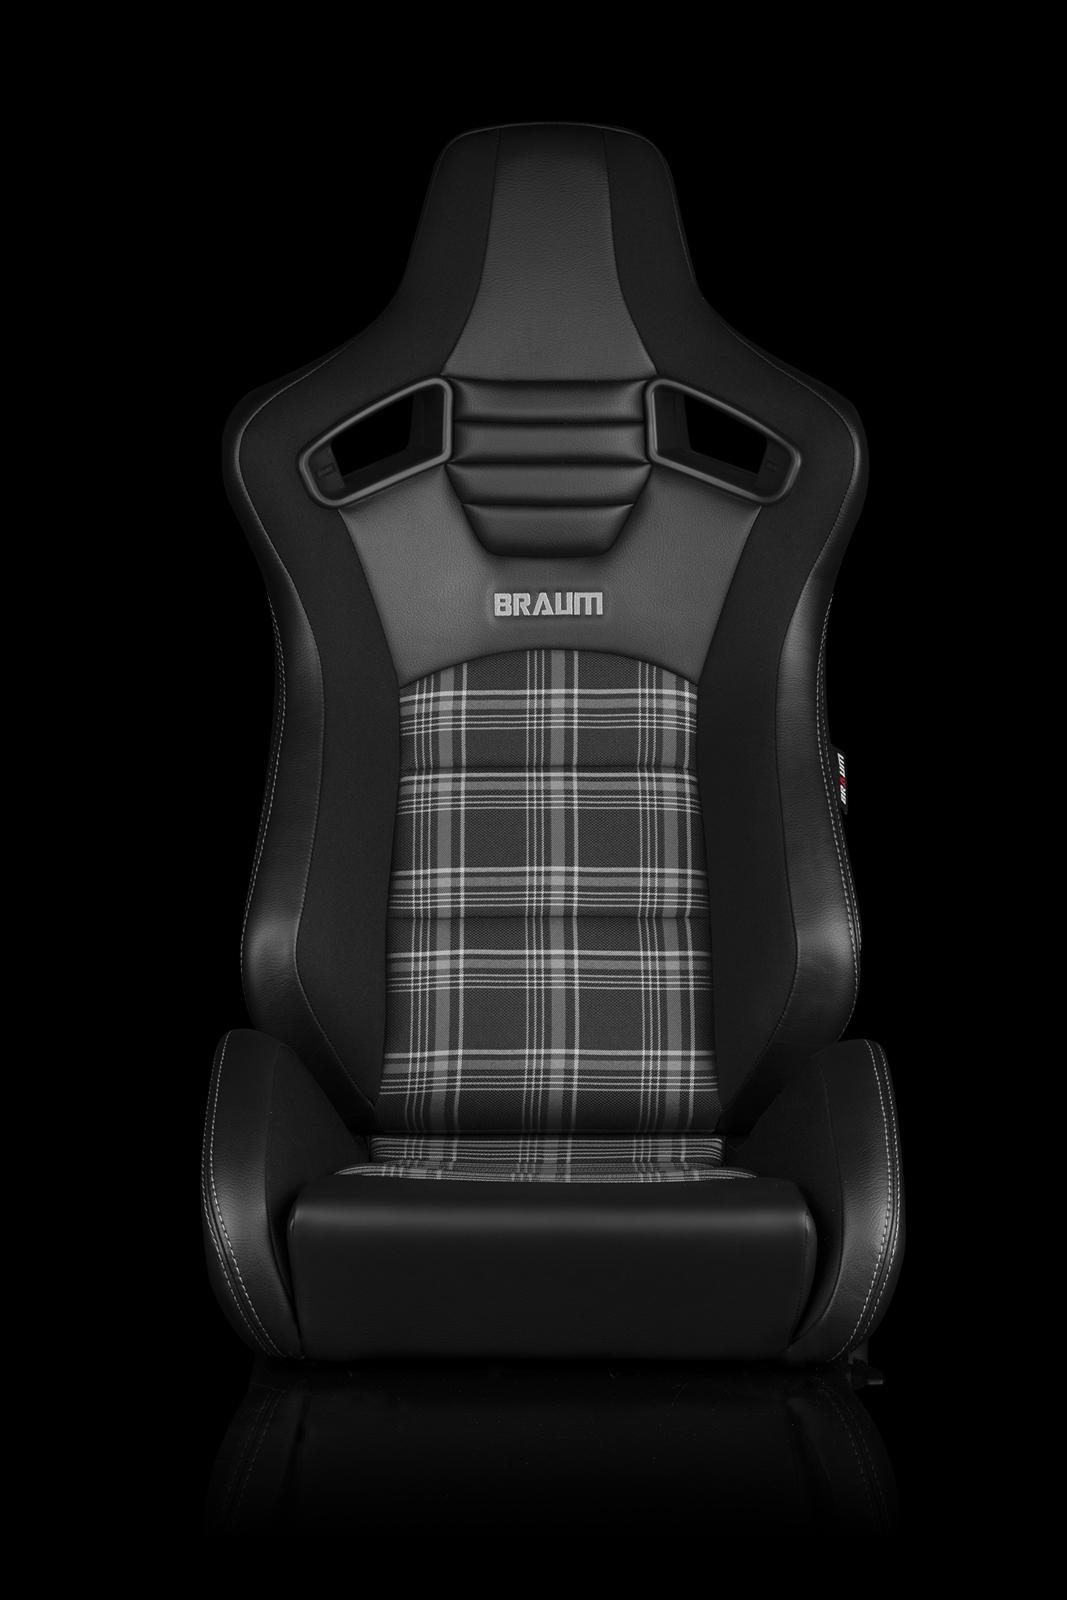 Braum Elite-S Series Sport Seats - Black & Grey Plaid (Grey Stitching) Pair - Universal